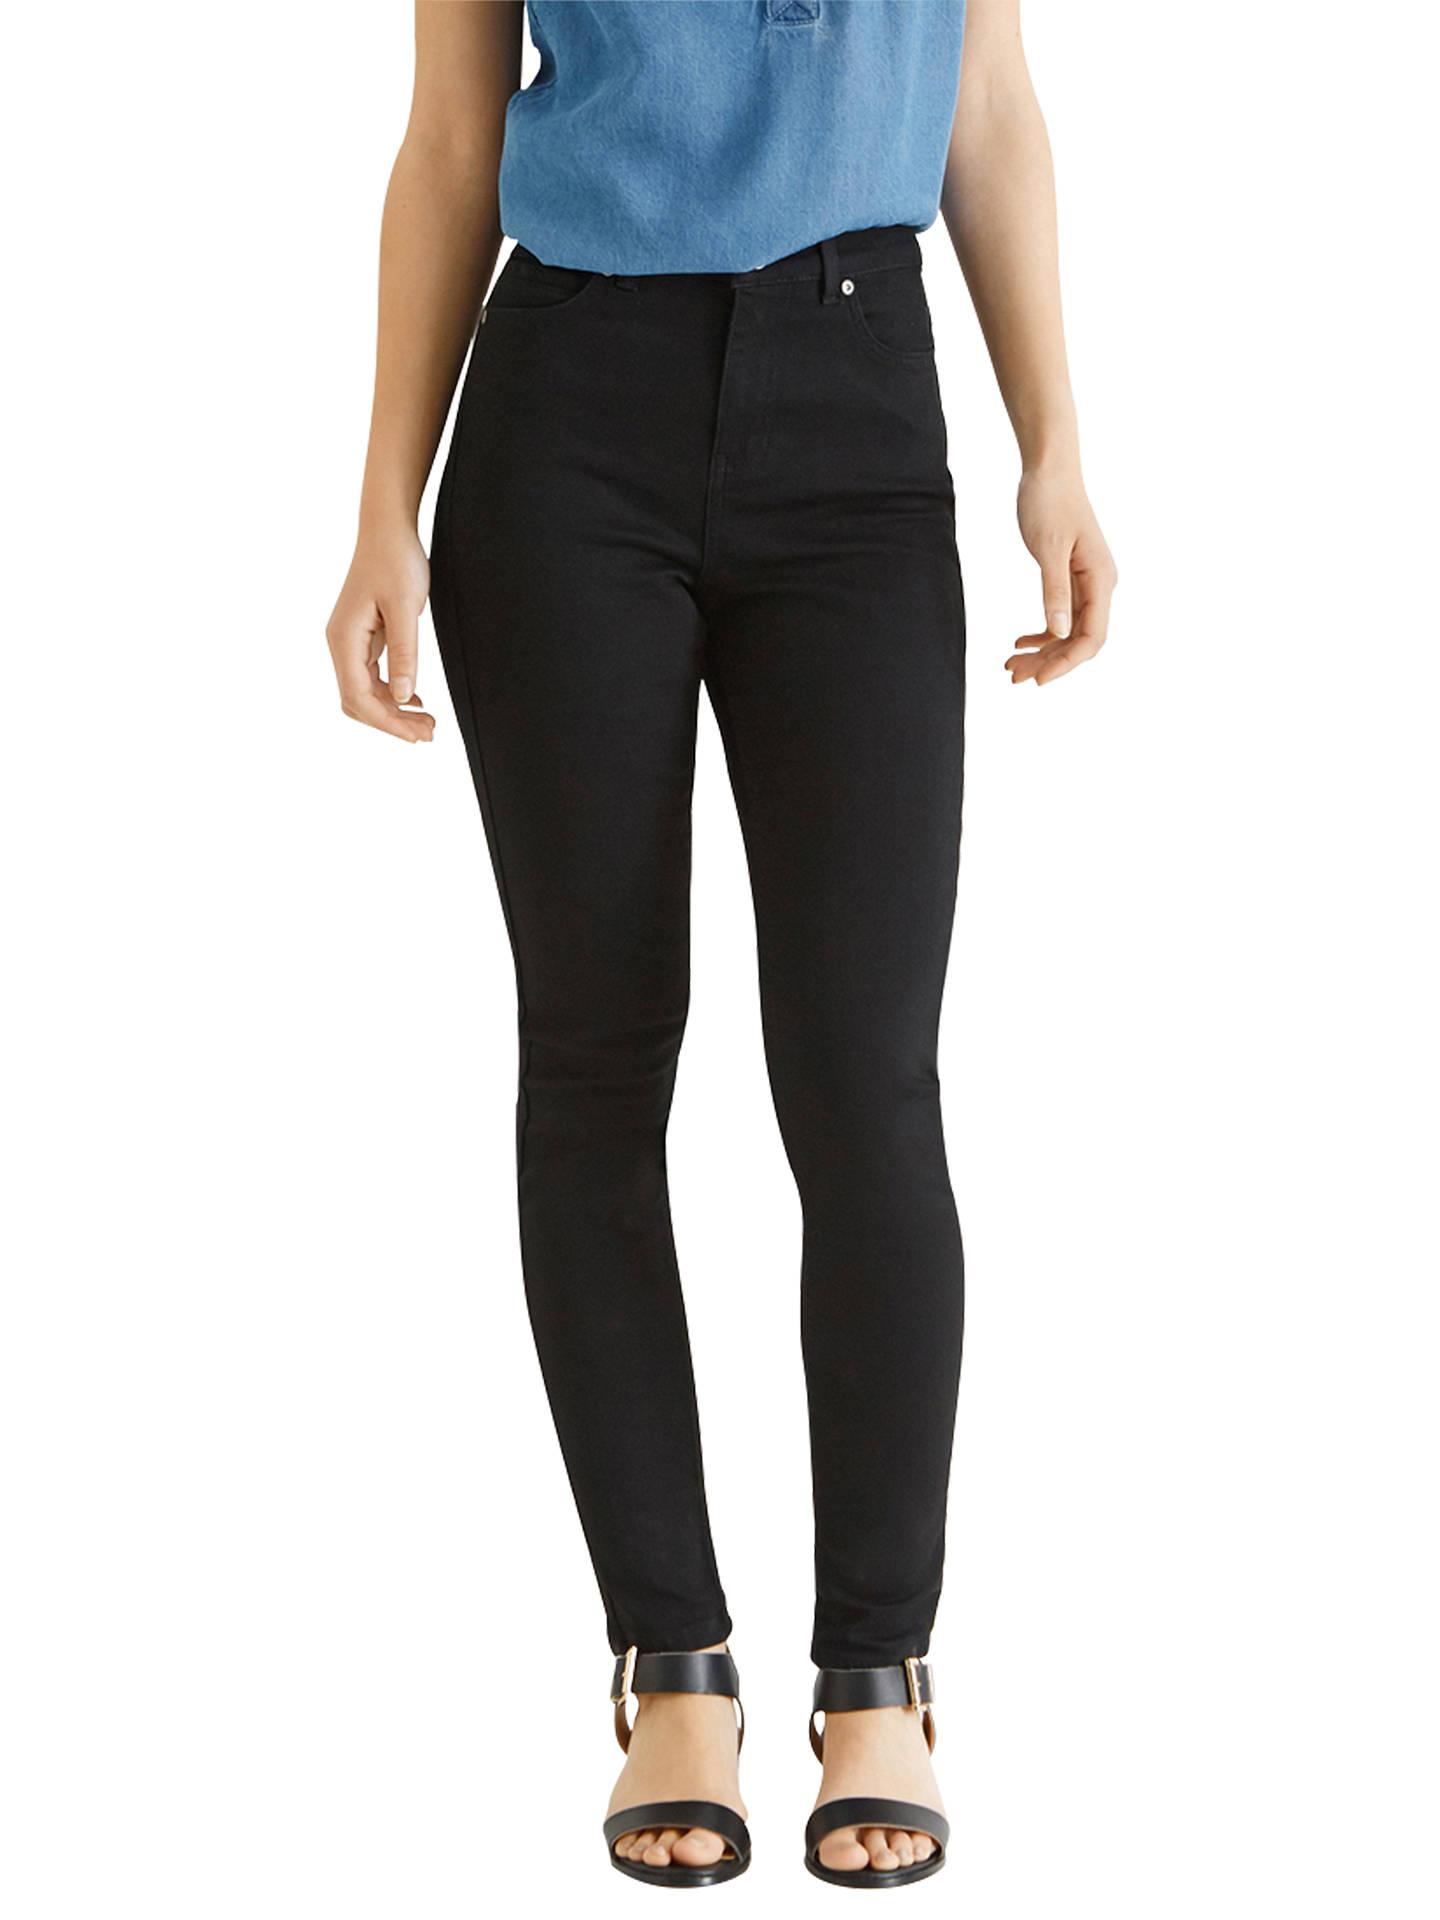 035f29aaf2e2 Buy Oasis Lily Skinny Jeans, Solid Black, 8 Online at johnlewis.com ...